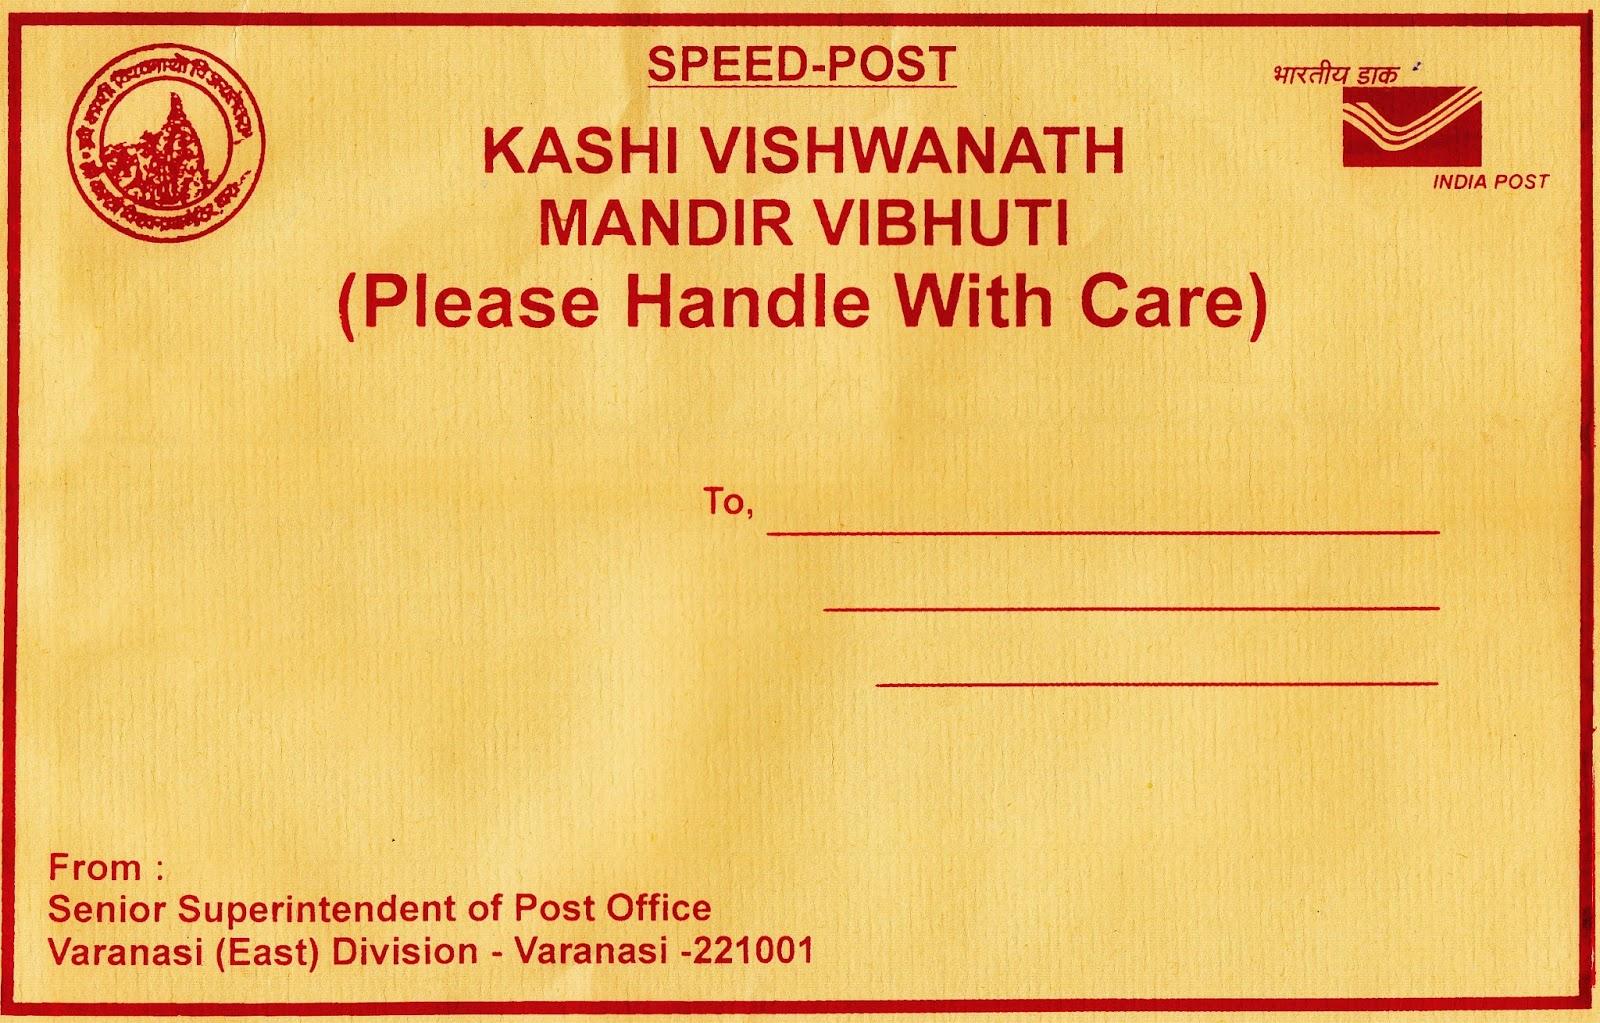 now get prasad of kashi now get prasad of kashi vishwanath and mahakaleshwar jyotirling by speed post in this savan